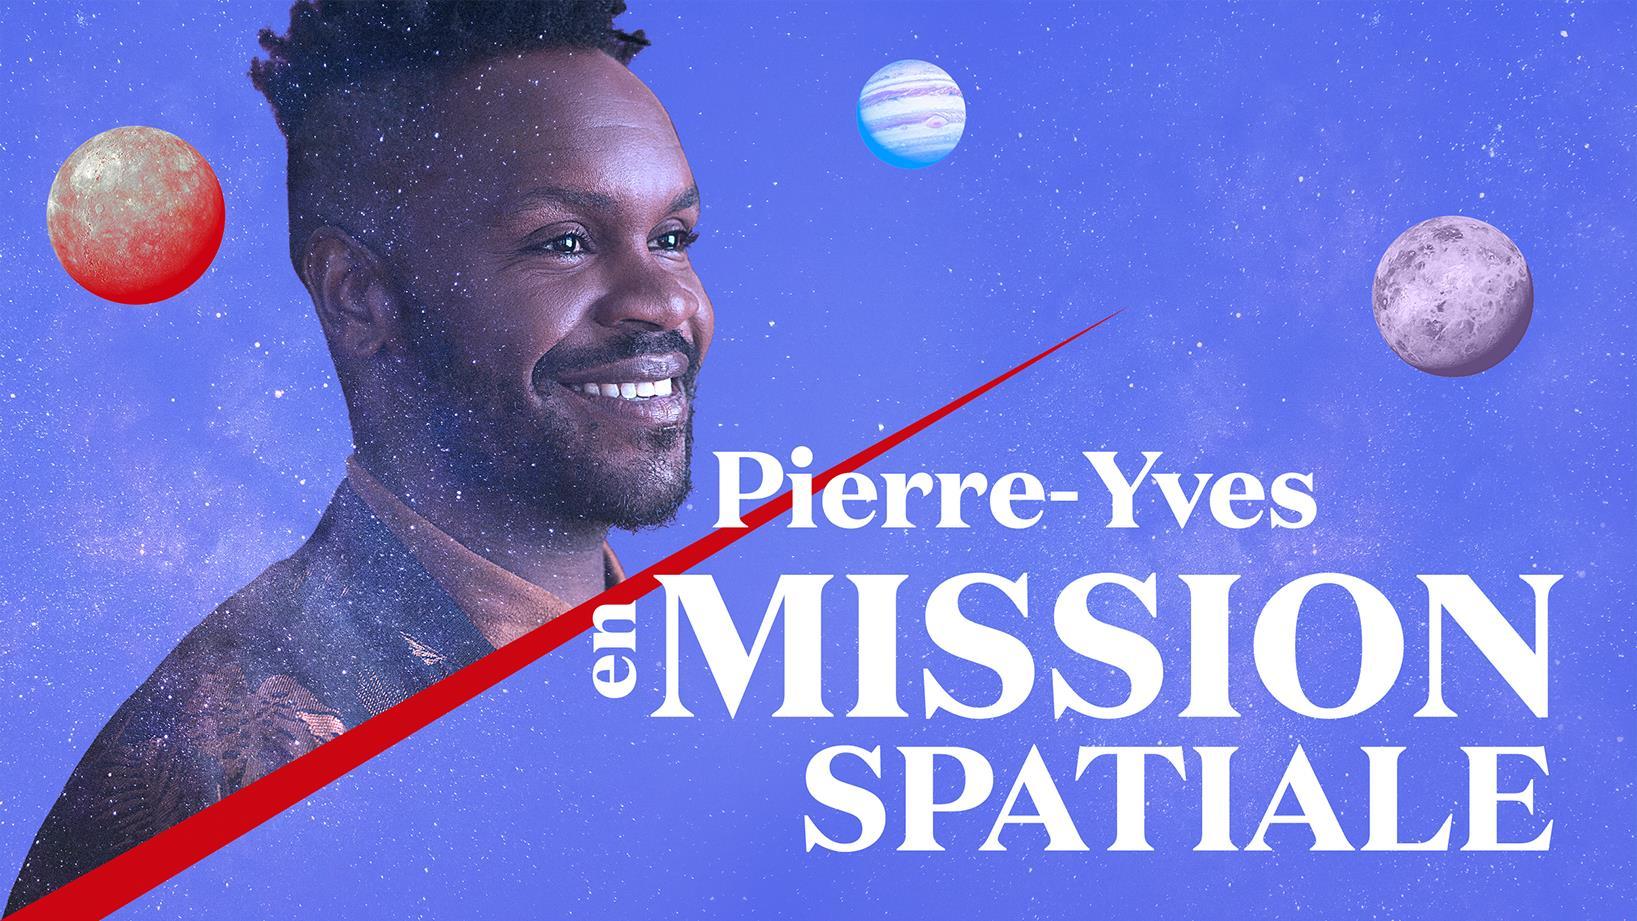 Pierre-Yves en mission spatiale | ICI Radio-Canada.ca Première